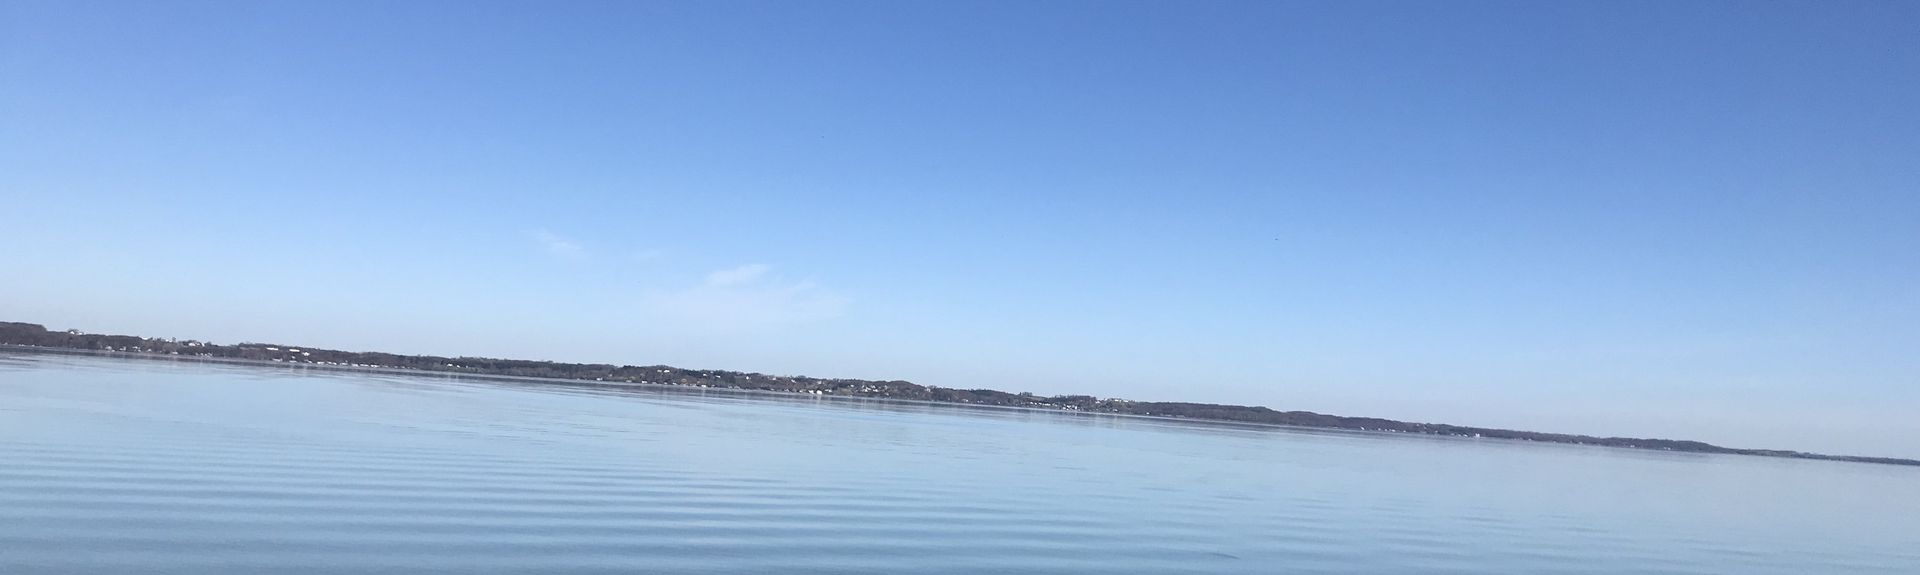 Clam River, Michigan, Verenigde Staten